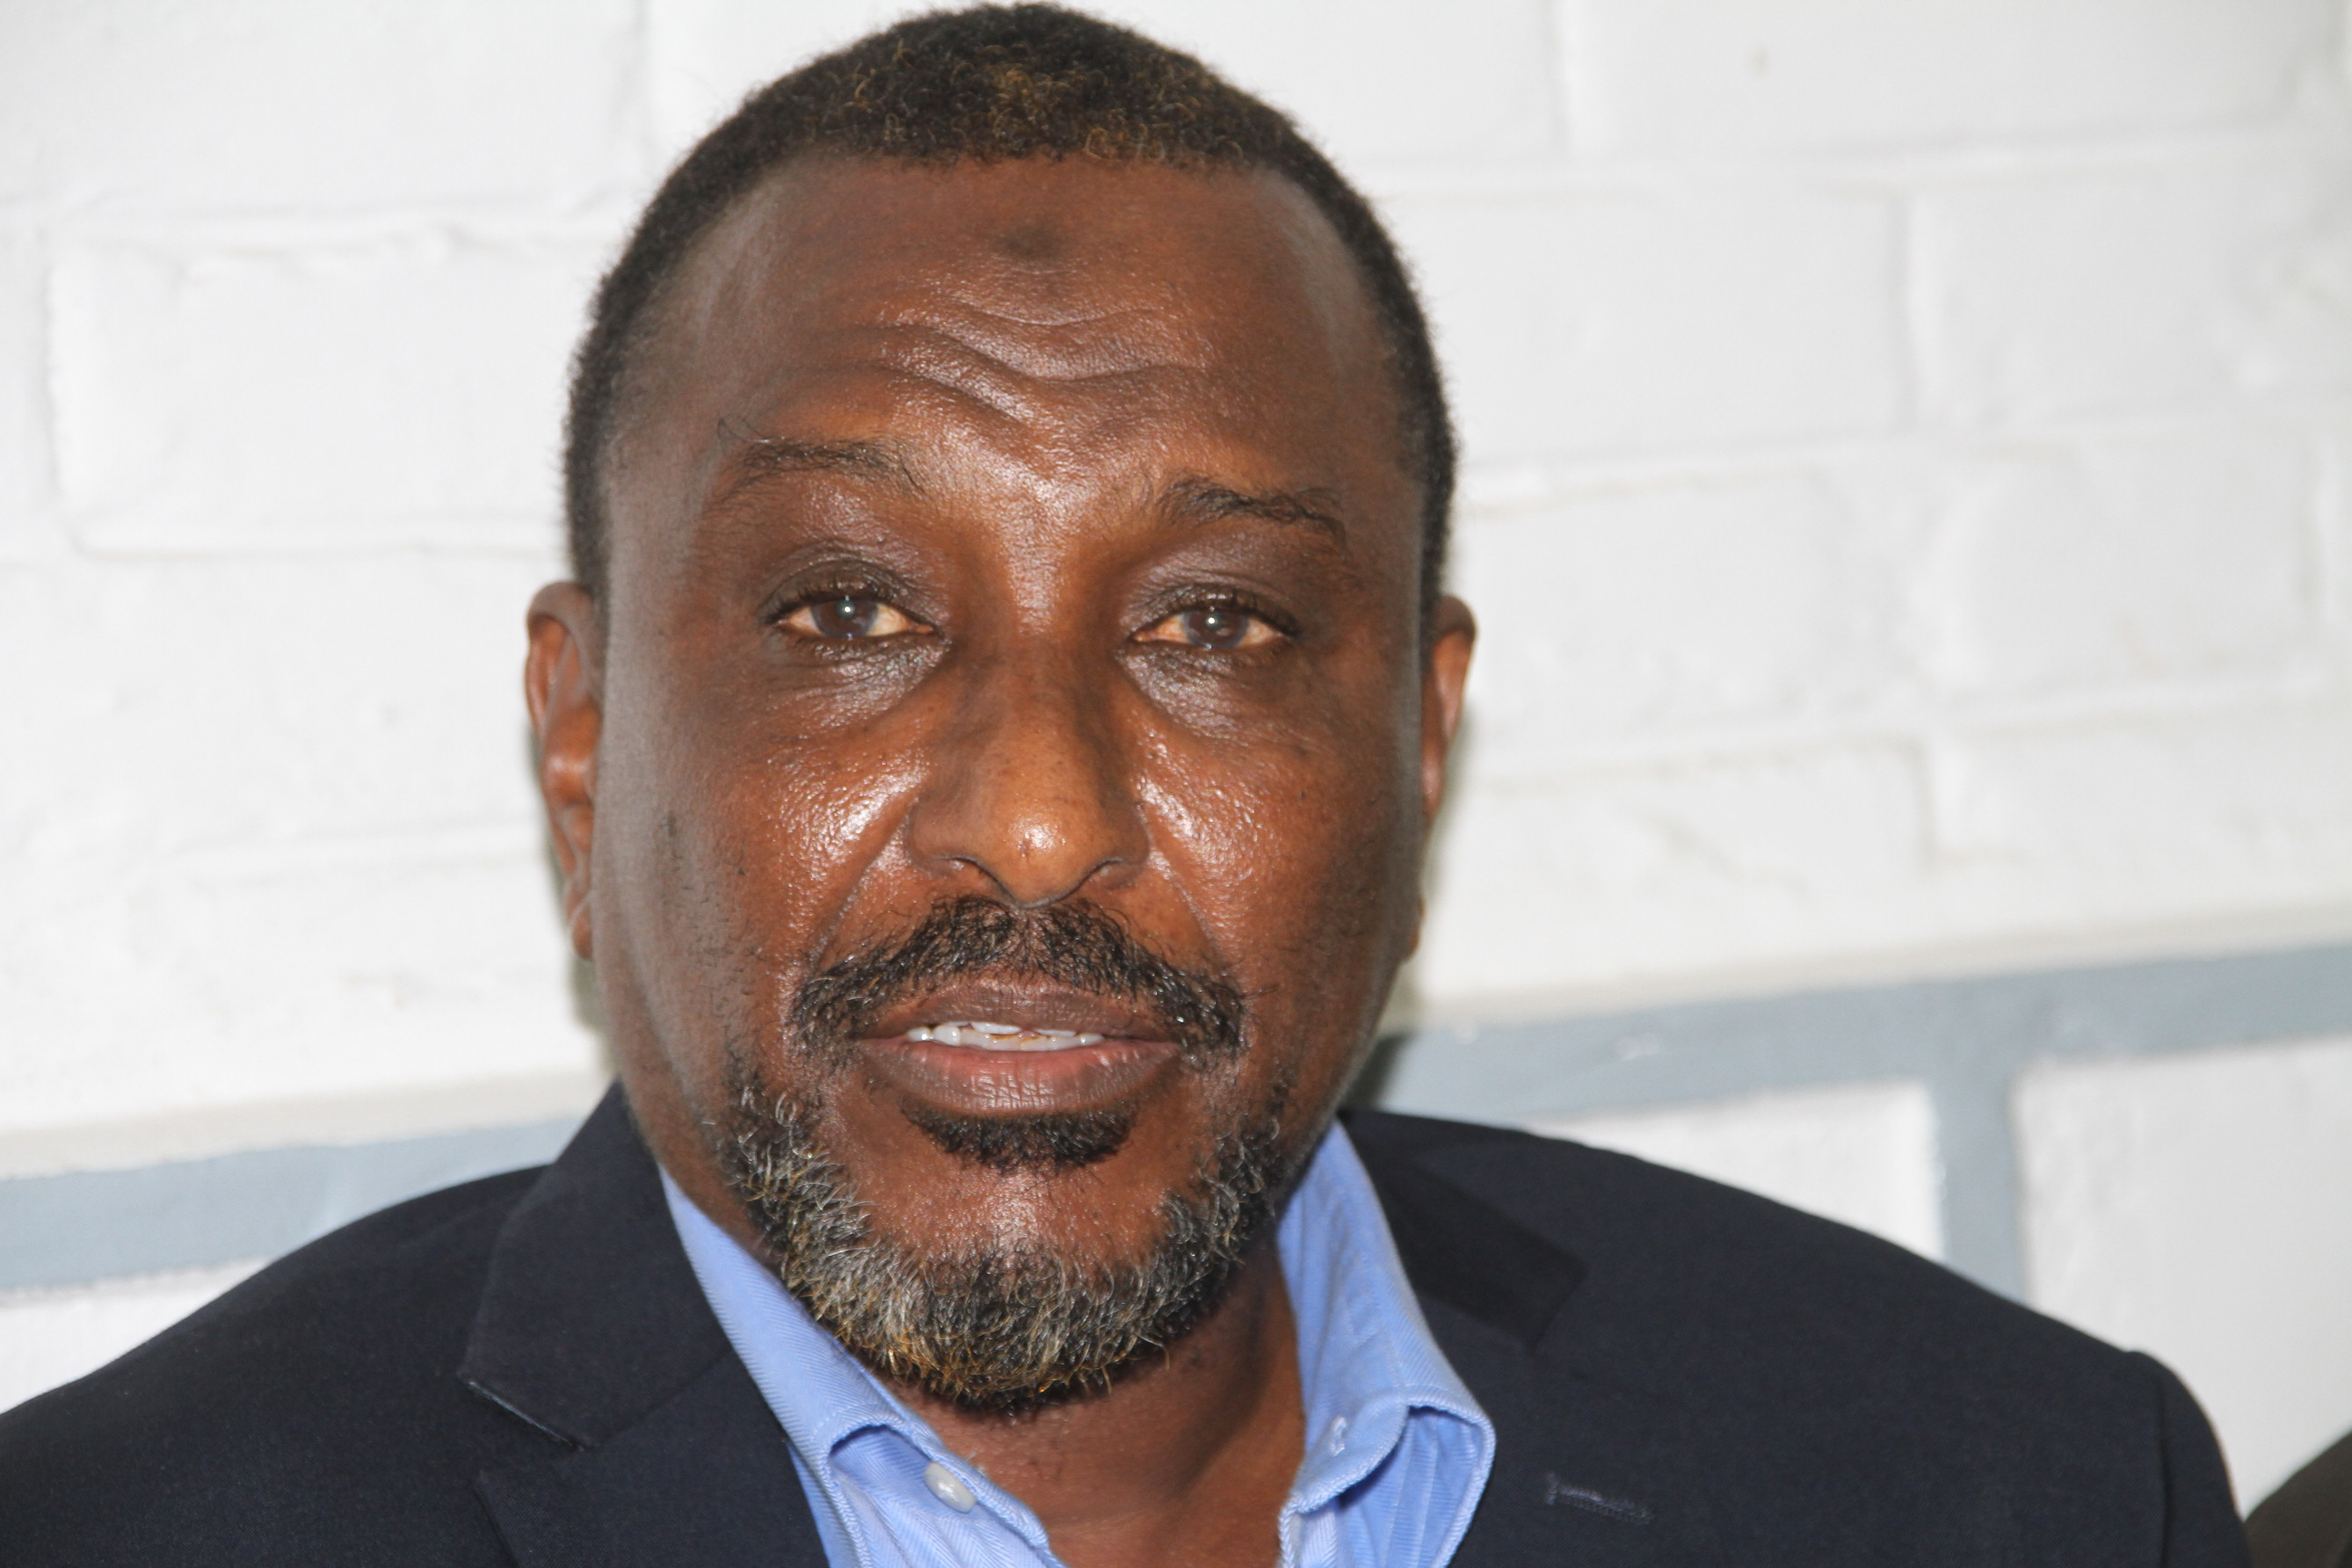 Chairman of Somalia's anti-piracy agency arrested in Belgium